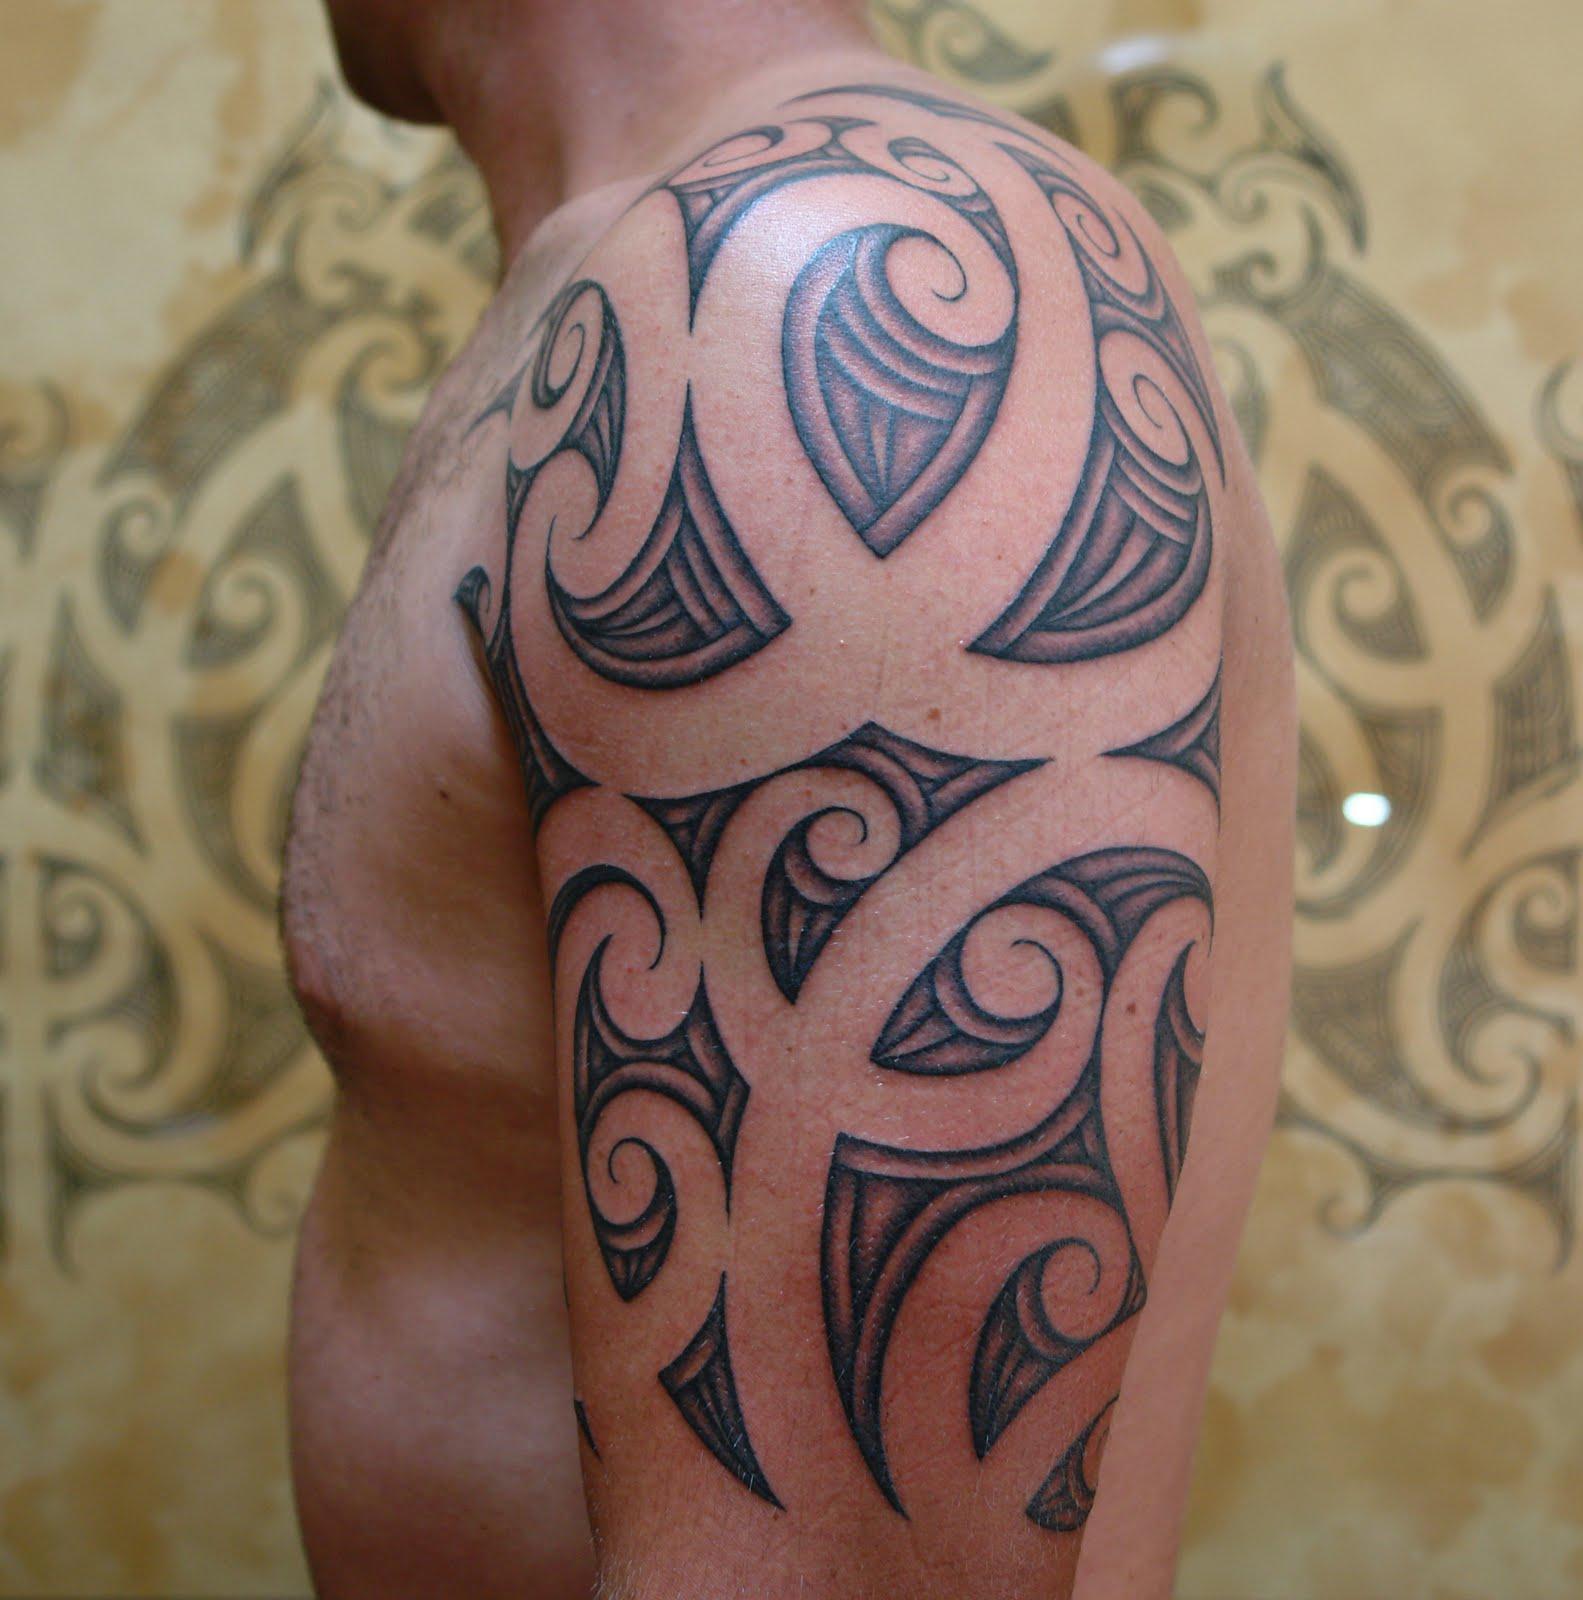 MAORI POLYNESIAN TATTOO: Maori Half Sleeve Tattoo